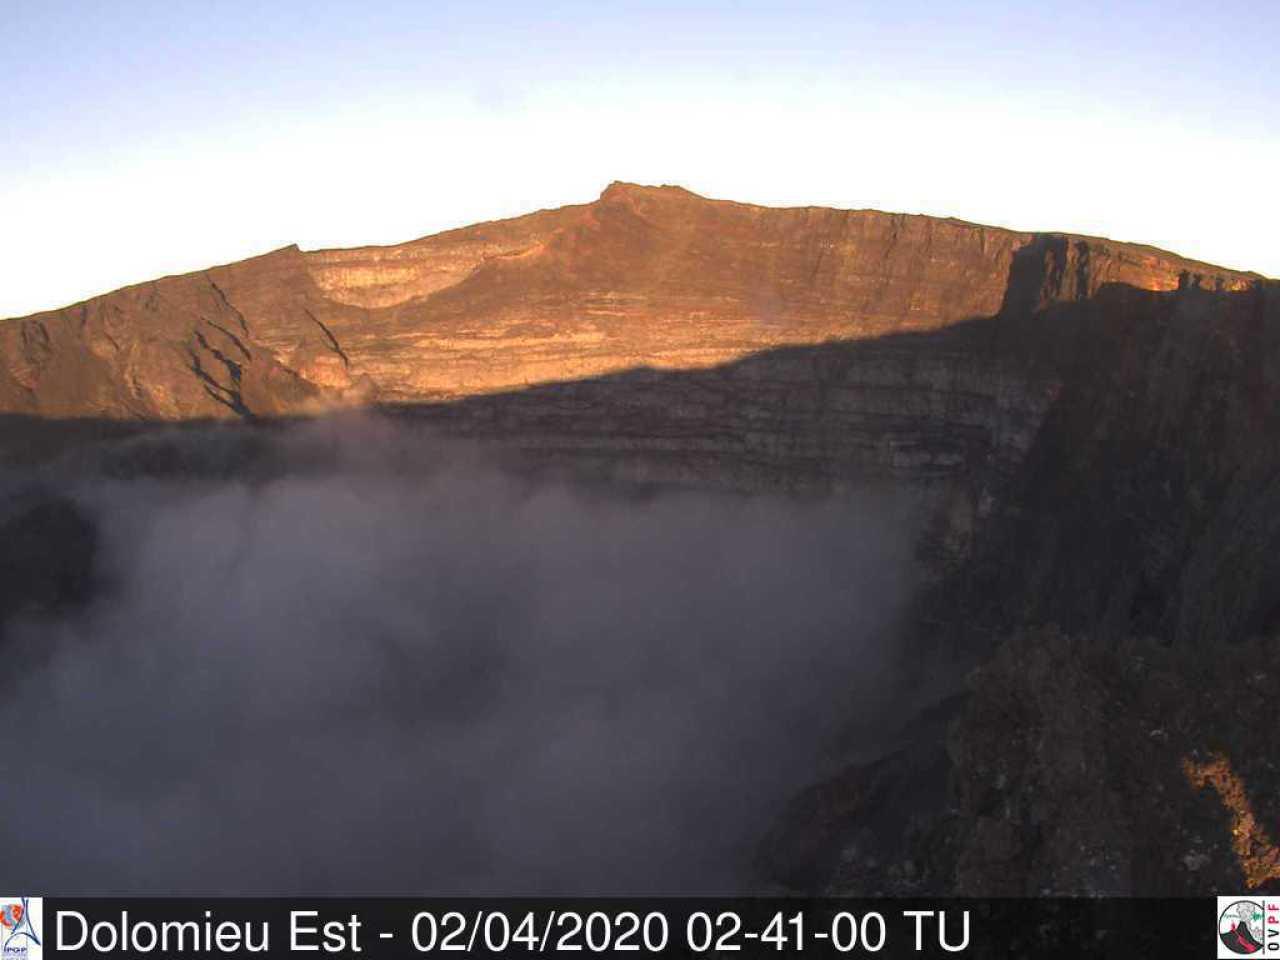 Piton de la Fournaise volcano today (image: OVPF)